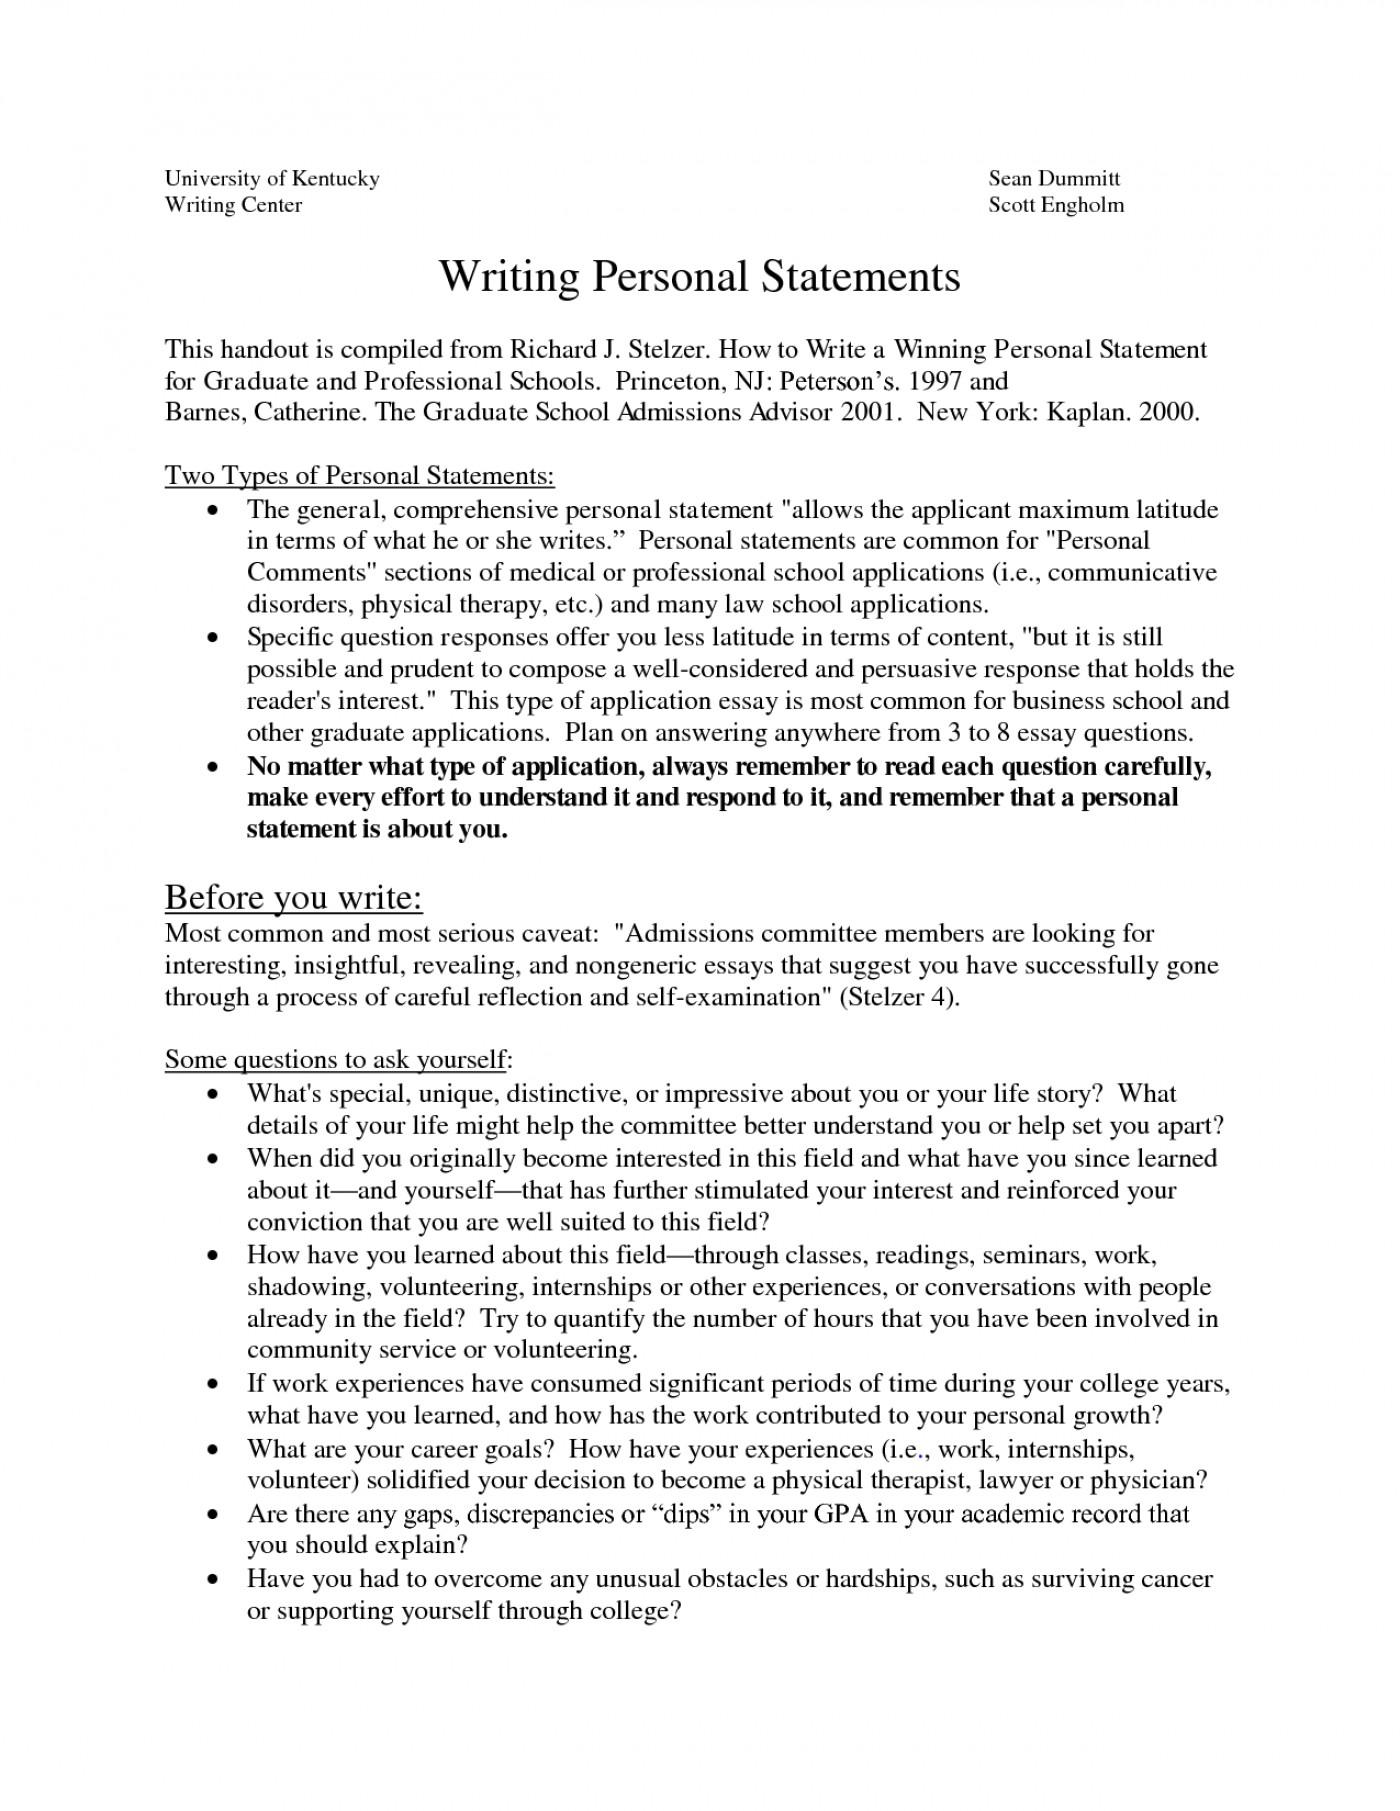 004 Essay Example Free Sample For Graduate School Formidable Admission Pdf 1400